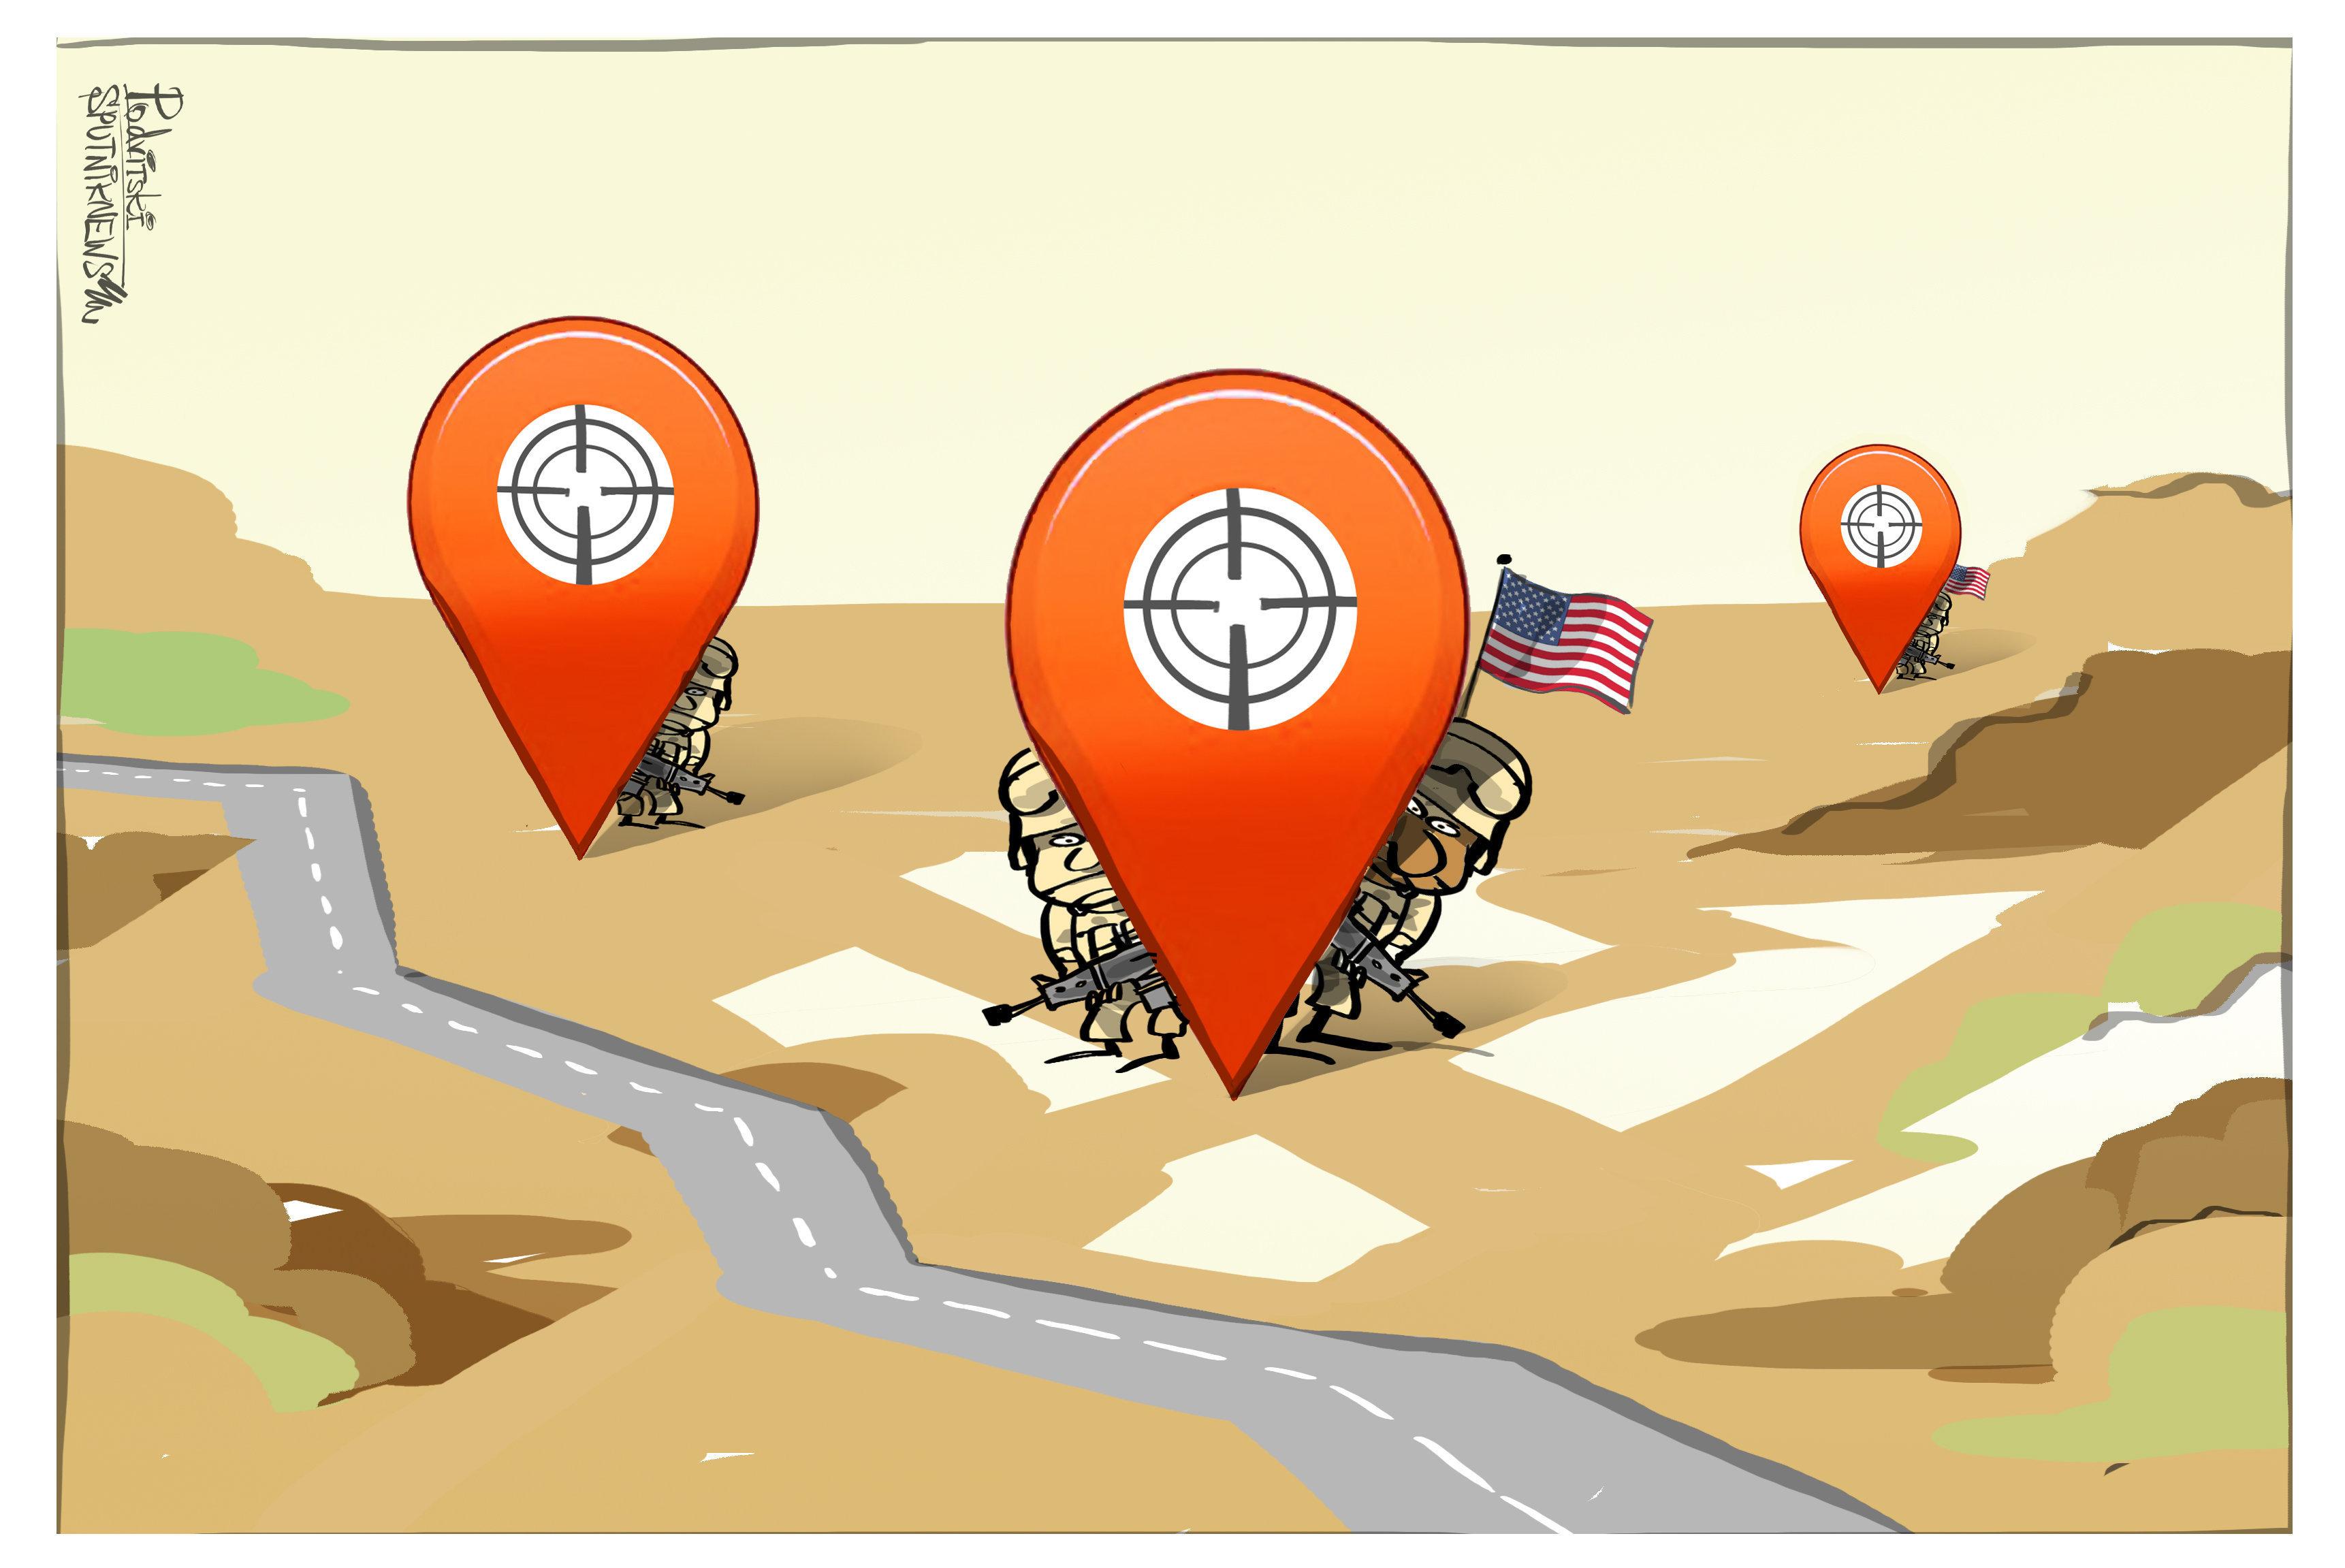 Сuando las bases militares de EEUU dejan de ser un secreto